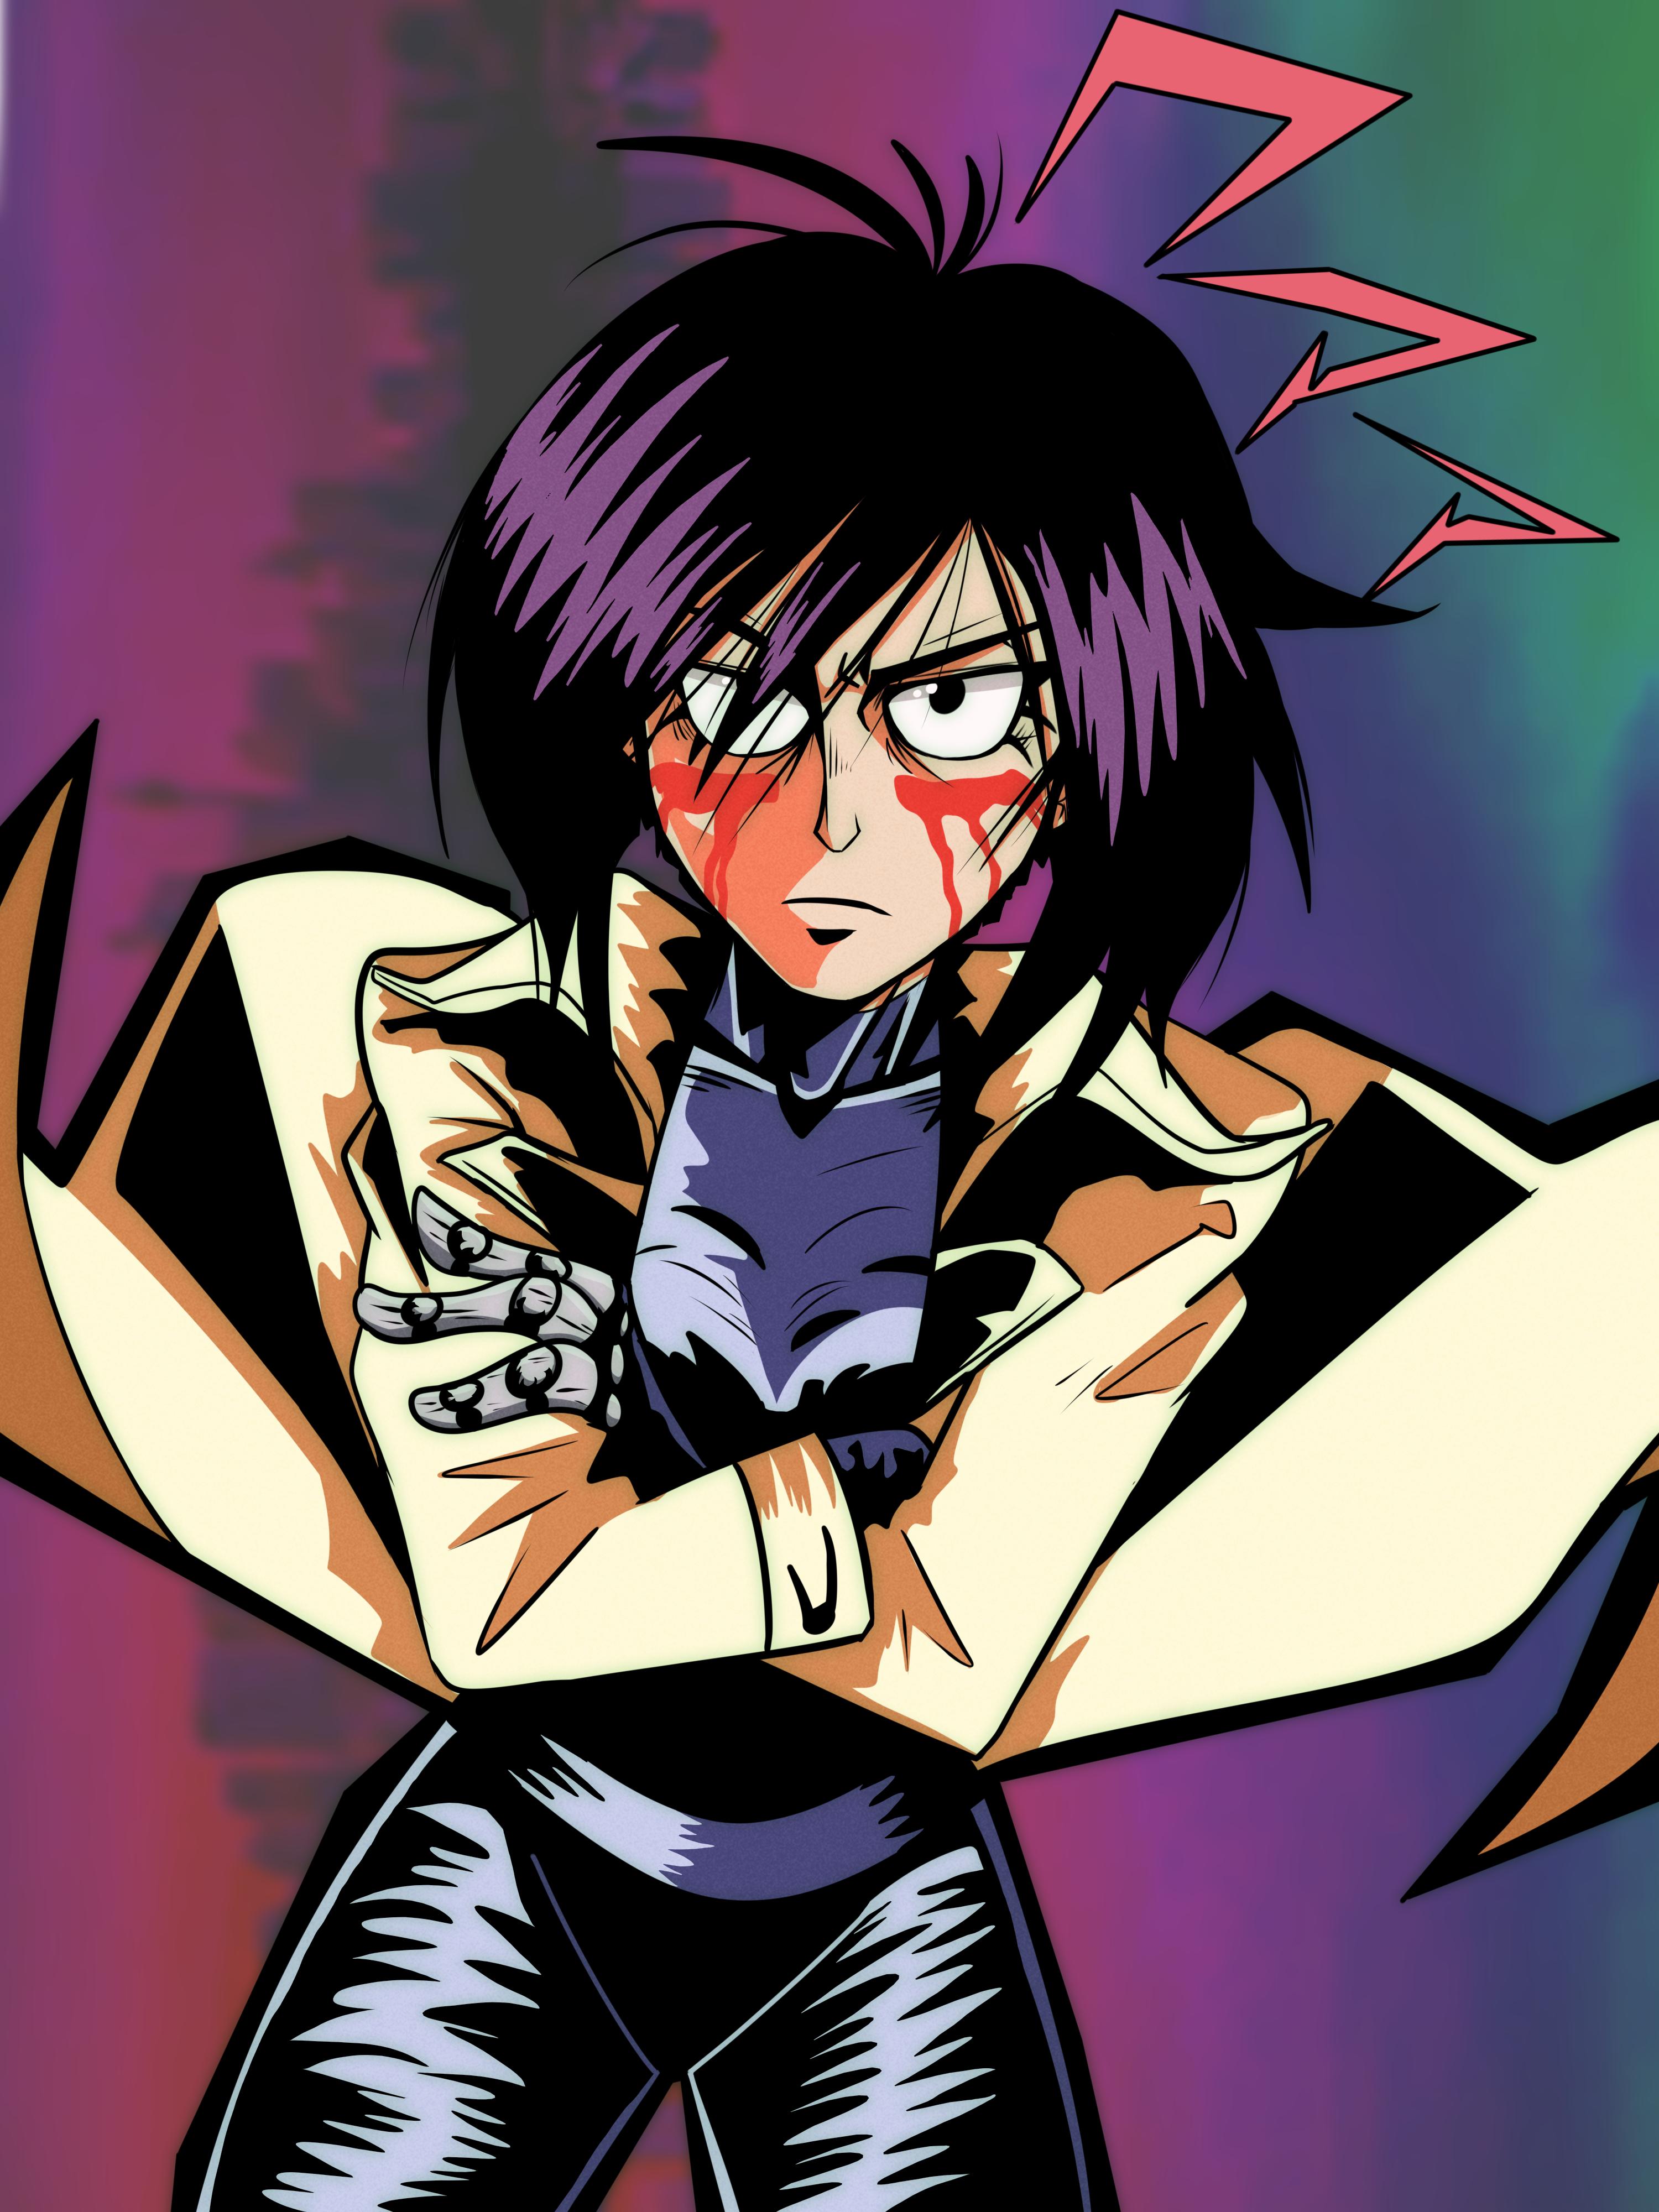 The Battle Angel, Alita